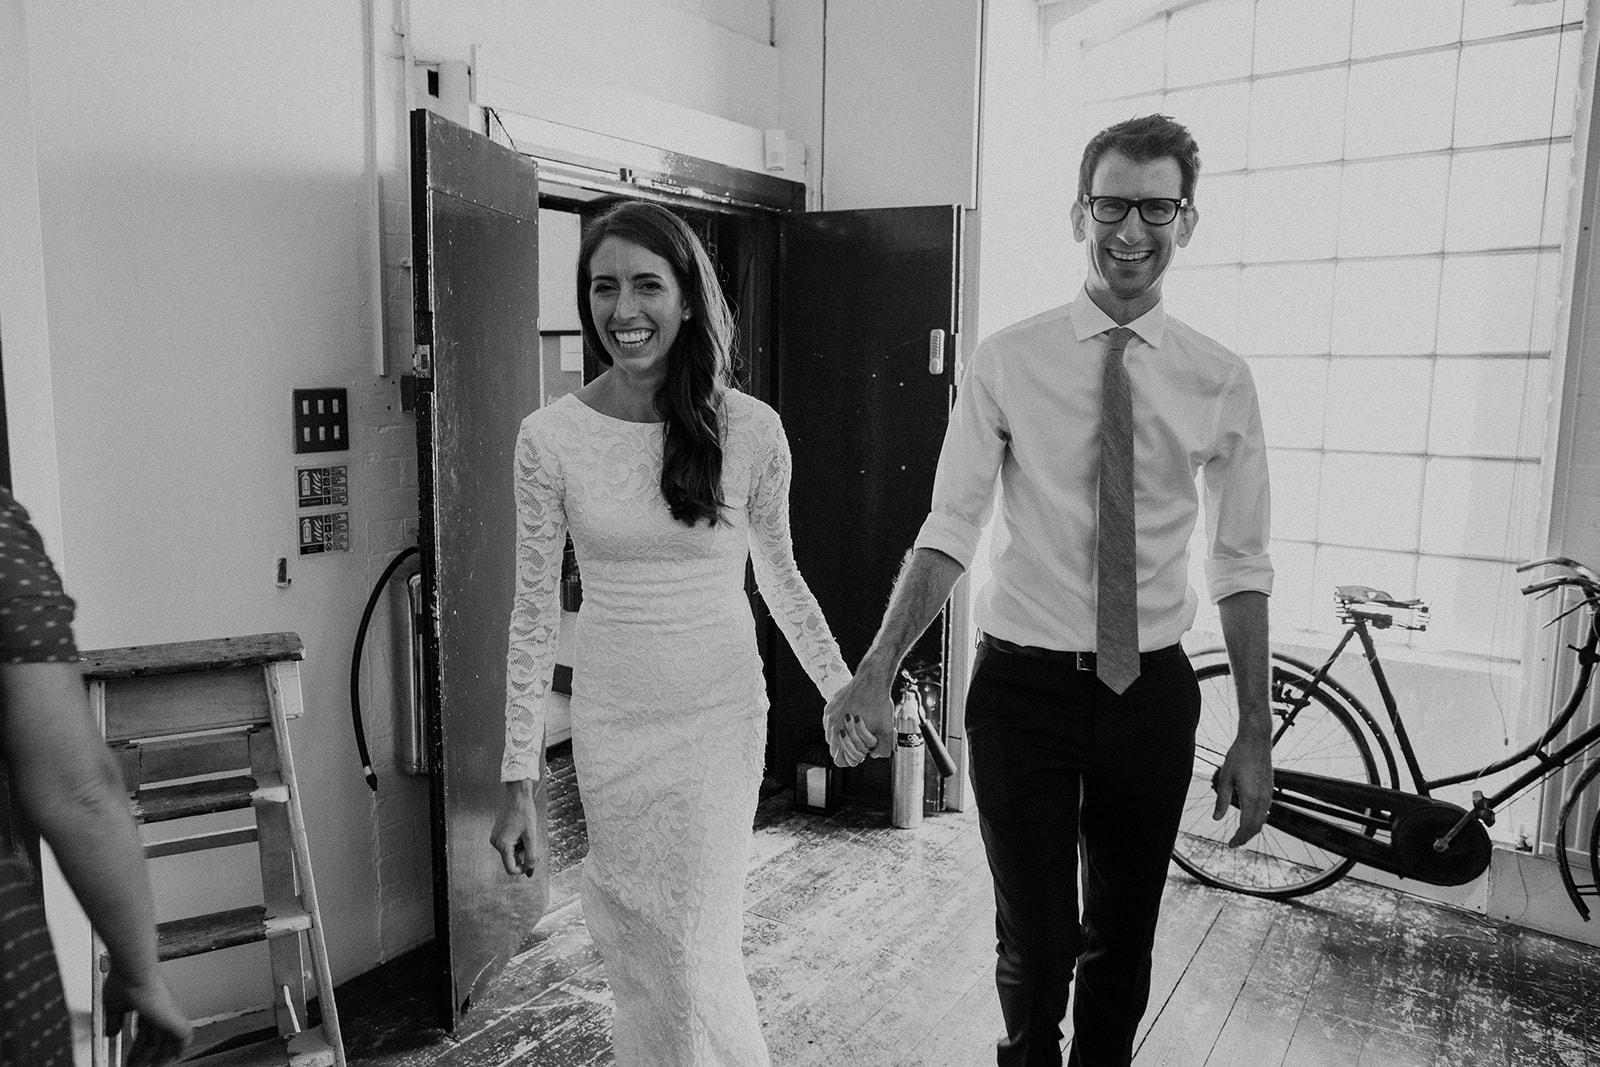 Adam and Emily - 08 - Wedding Breakfast - Sara Lincoln Photography-15.jpg